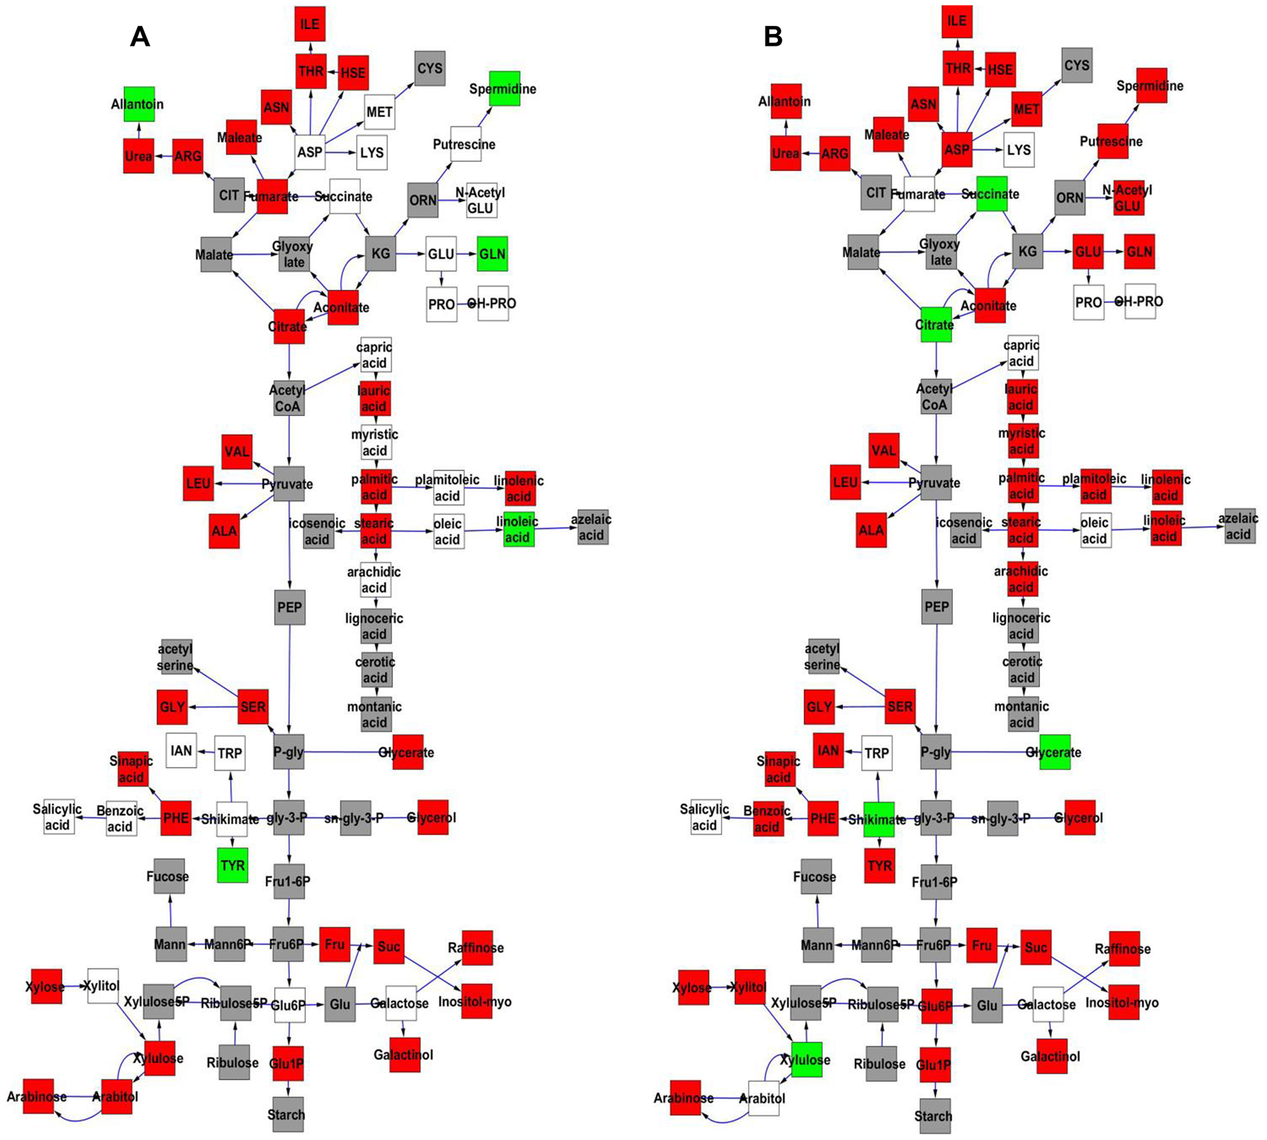 Comparative effect of cytoplasmic genomic variation on Metabolite average and CV.